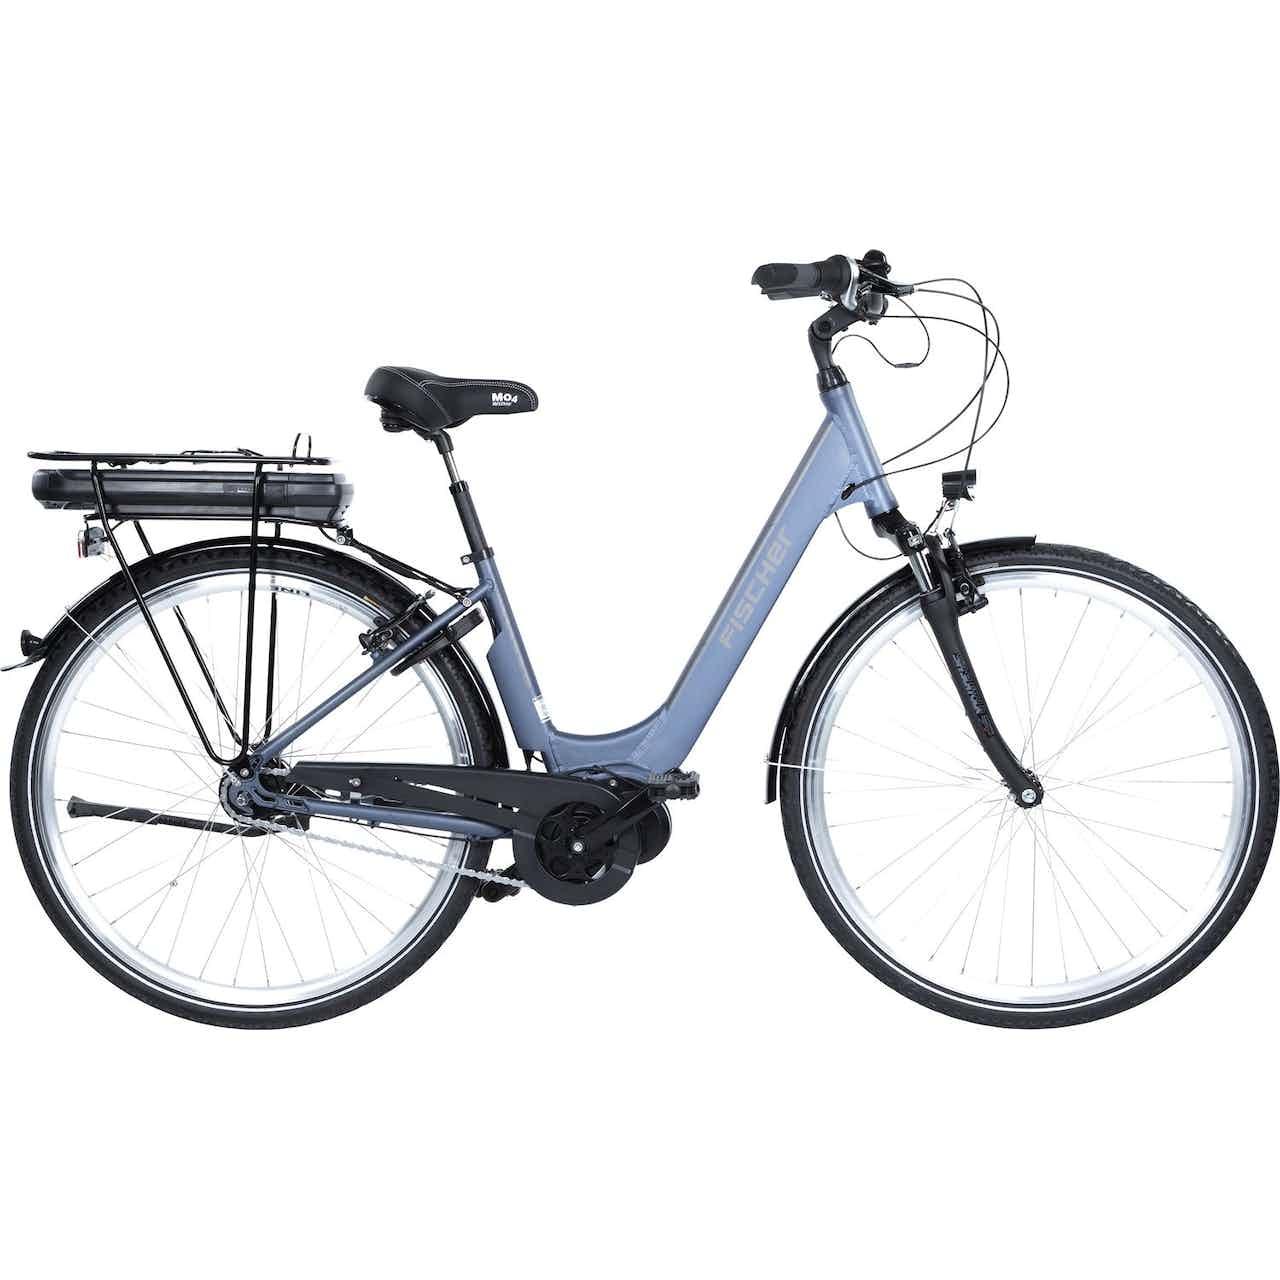 "Fischer E-Bike Damen City-Fahrrad Tiefeinsteiger 28"" Cita 2.0-S1"